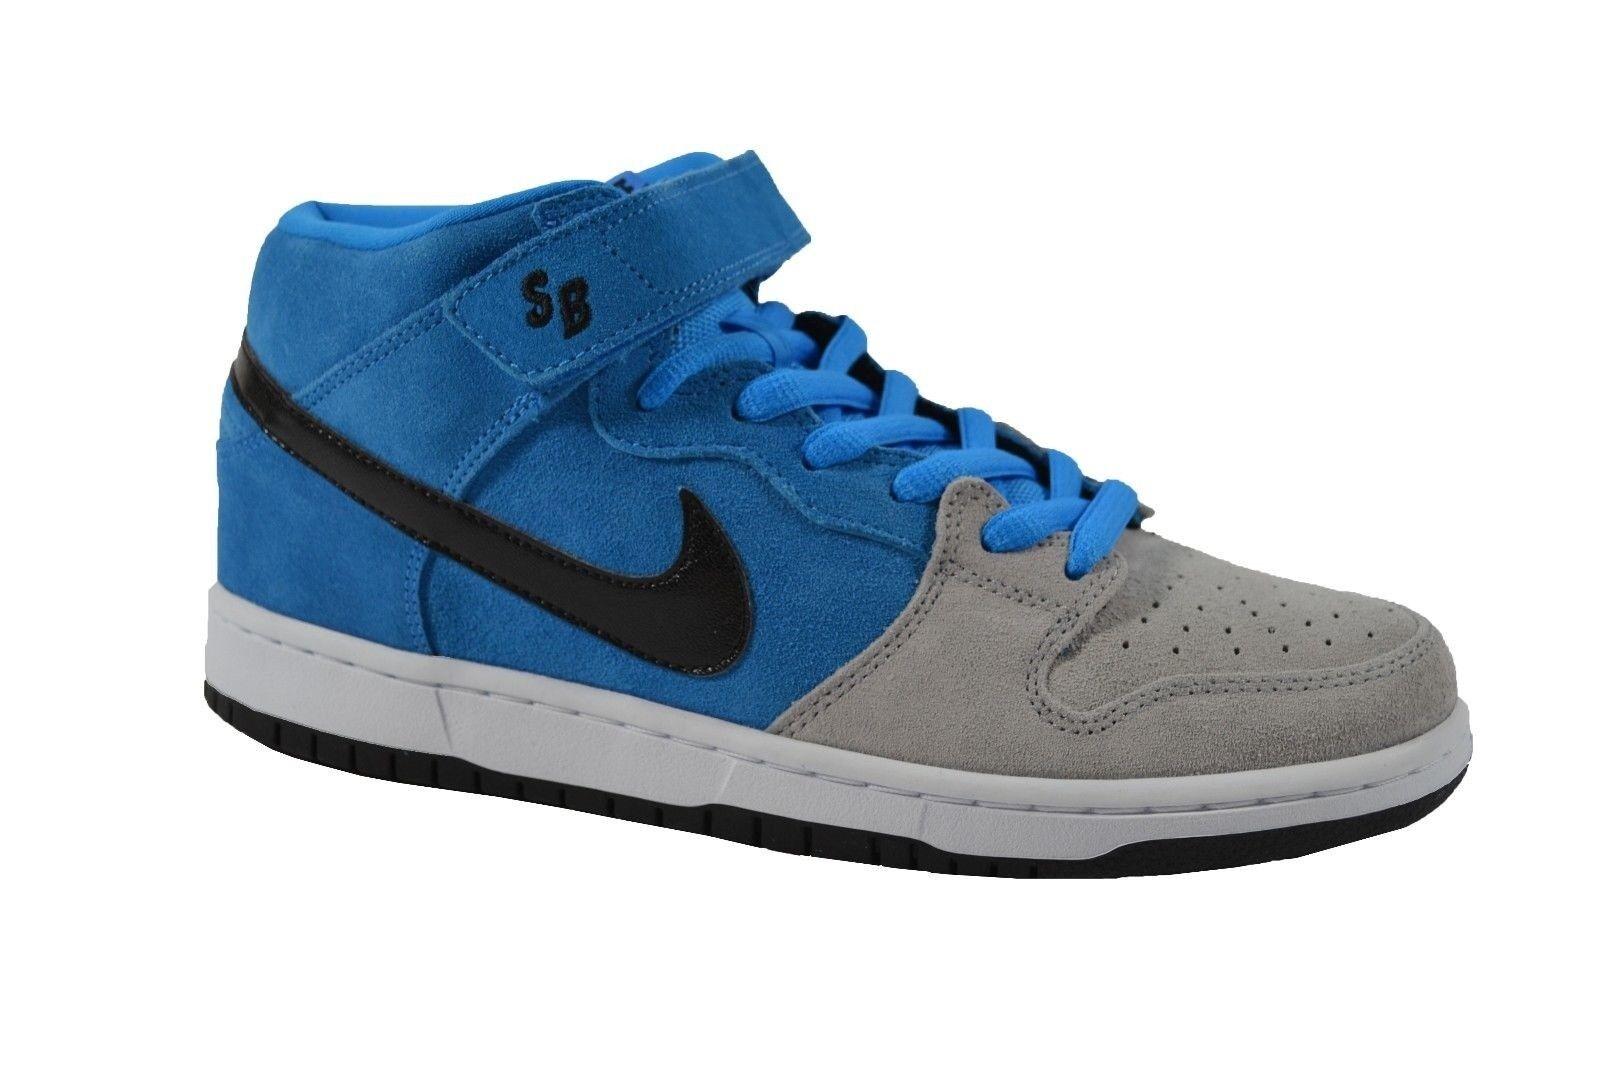 Nike DUNK PRO SB Hero Blue Black Wolf Men's Grey Skate Discounted (286) Men's Wolf Shoes 64de5b